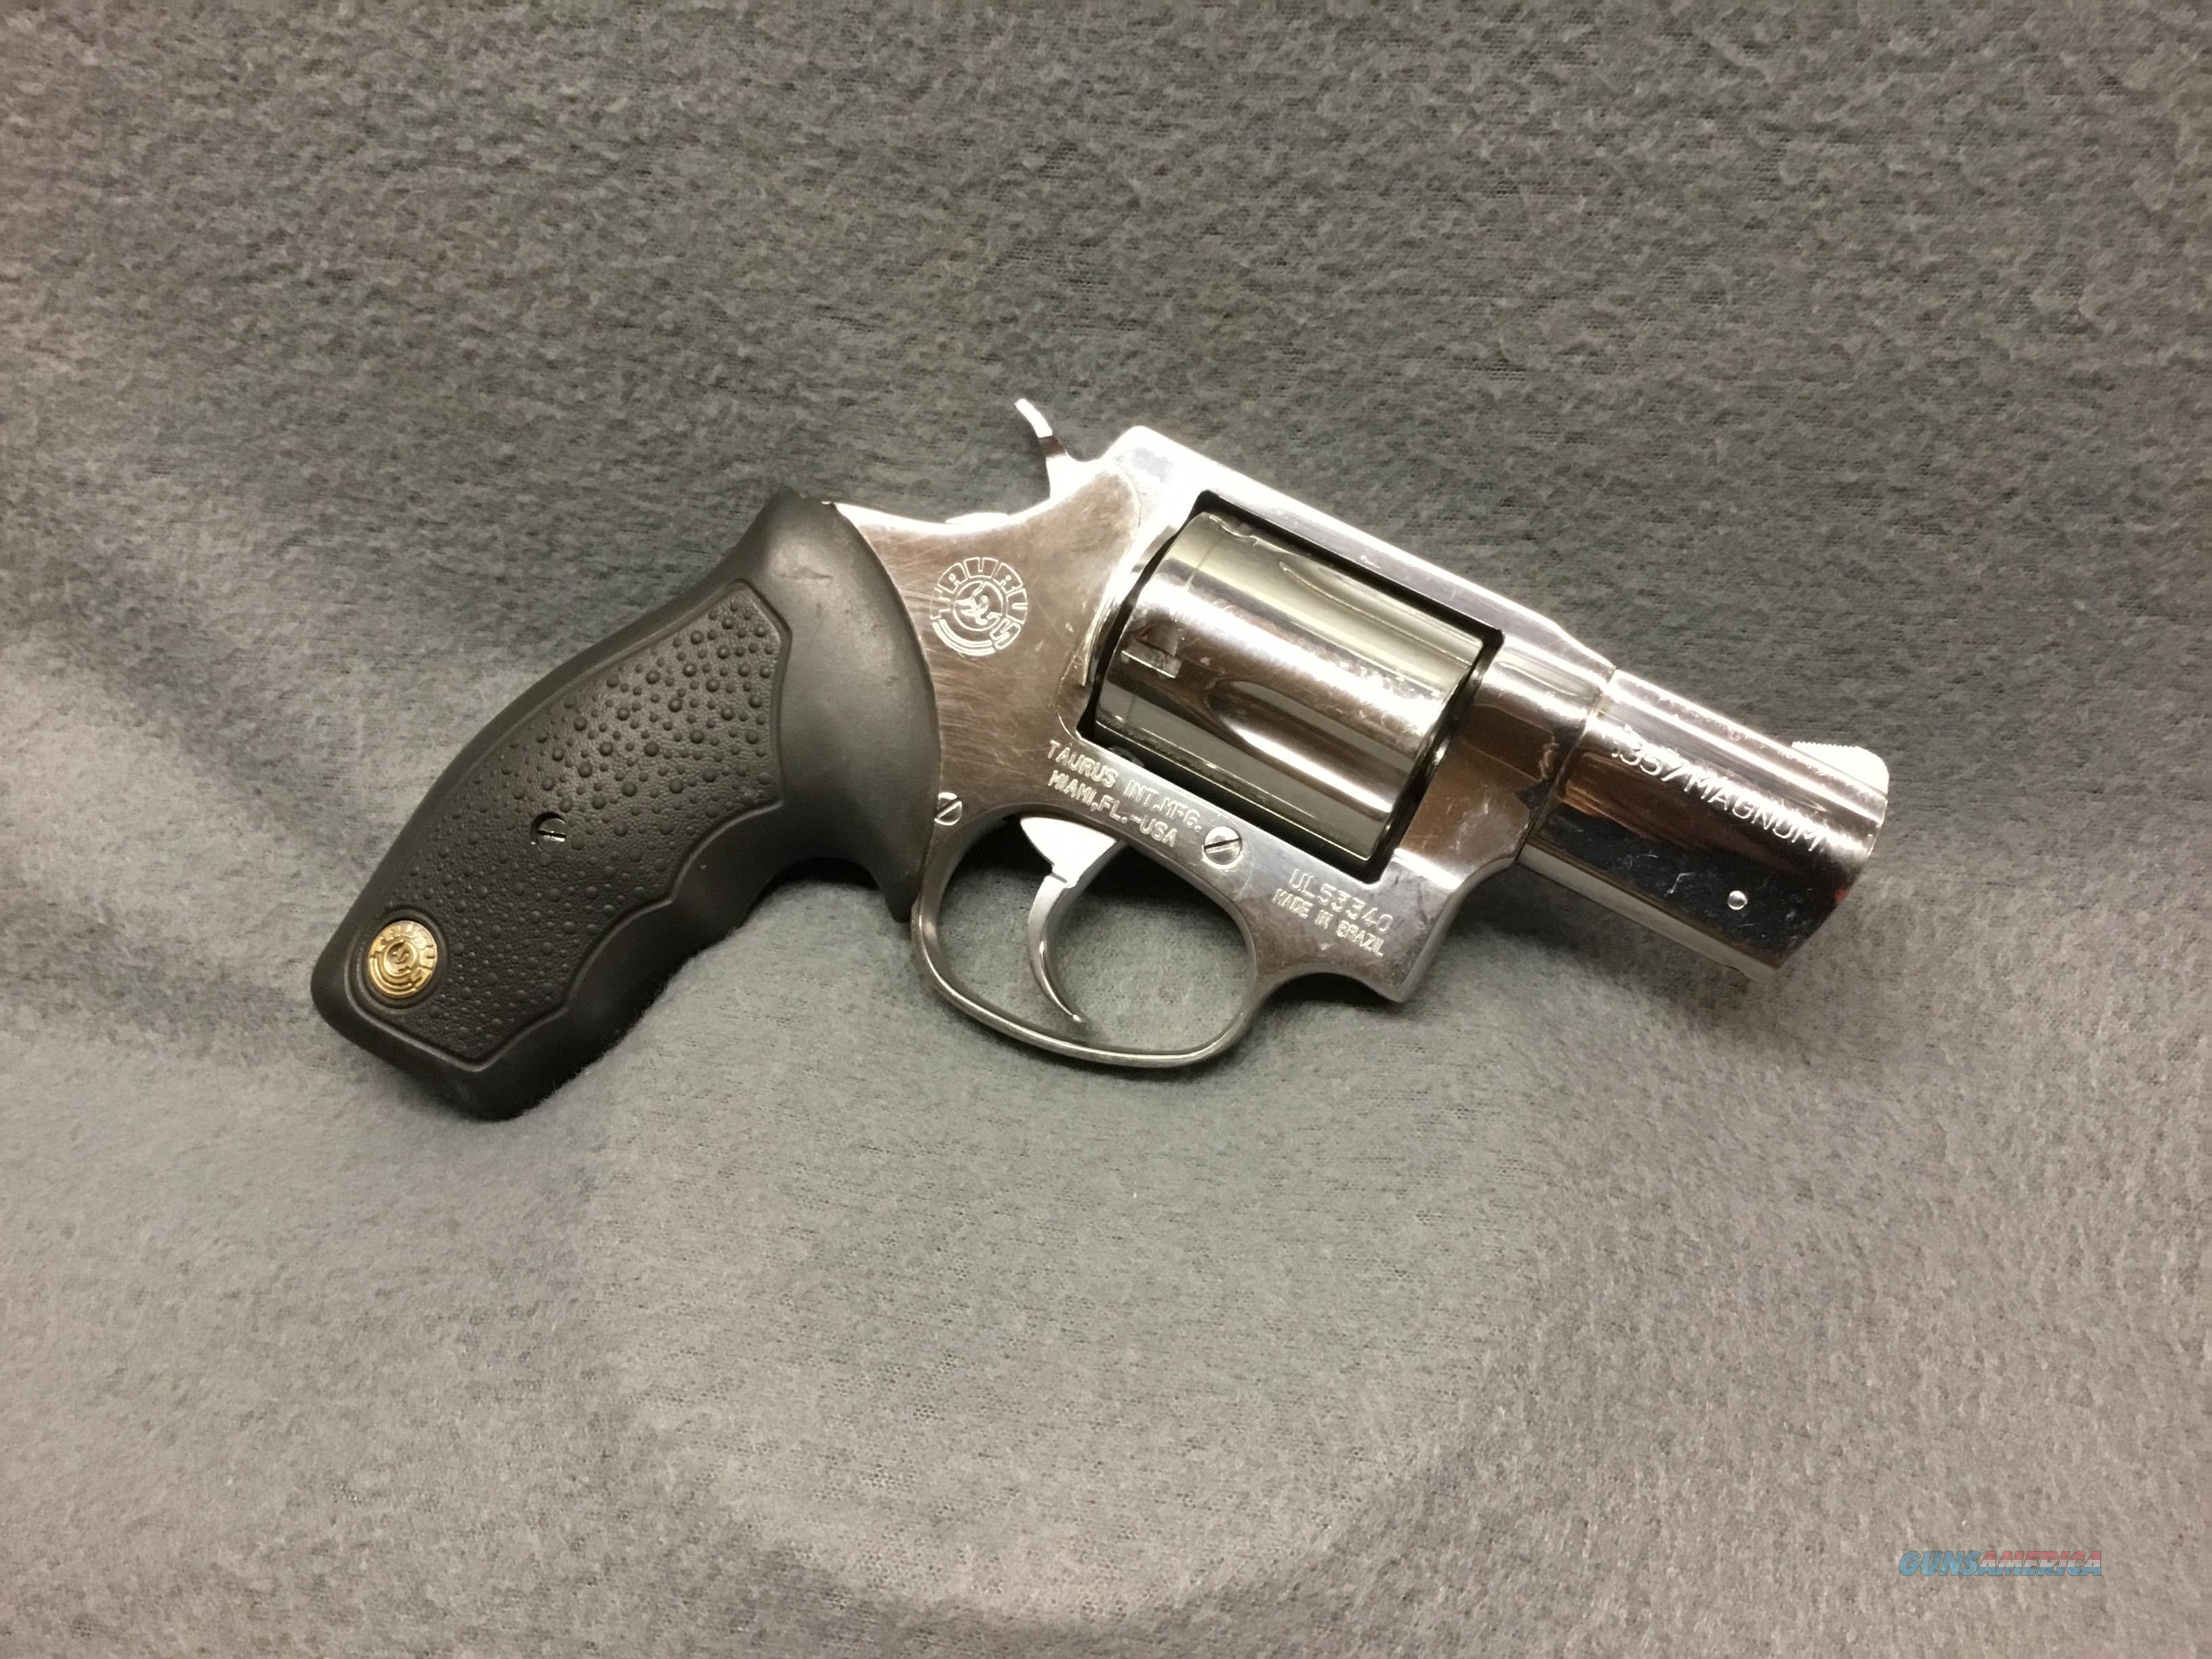 TAURUS  605            357 MAG SNUBBY  STAINLESS  Guns > Pistols > Taurus Pistols > Revolvers